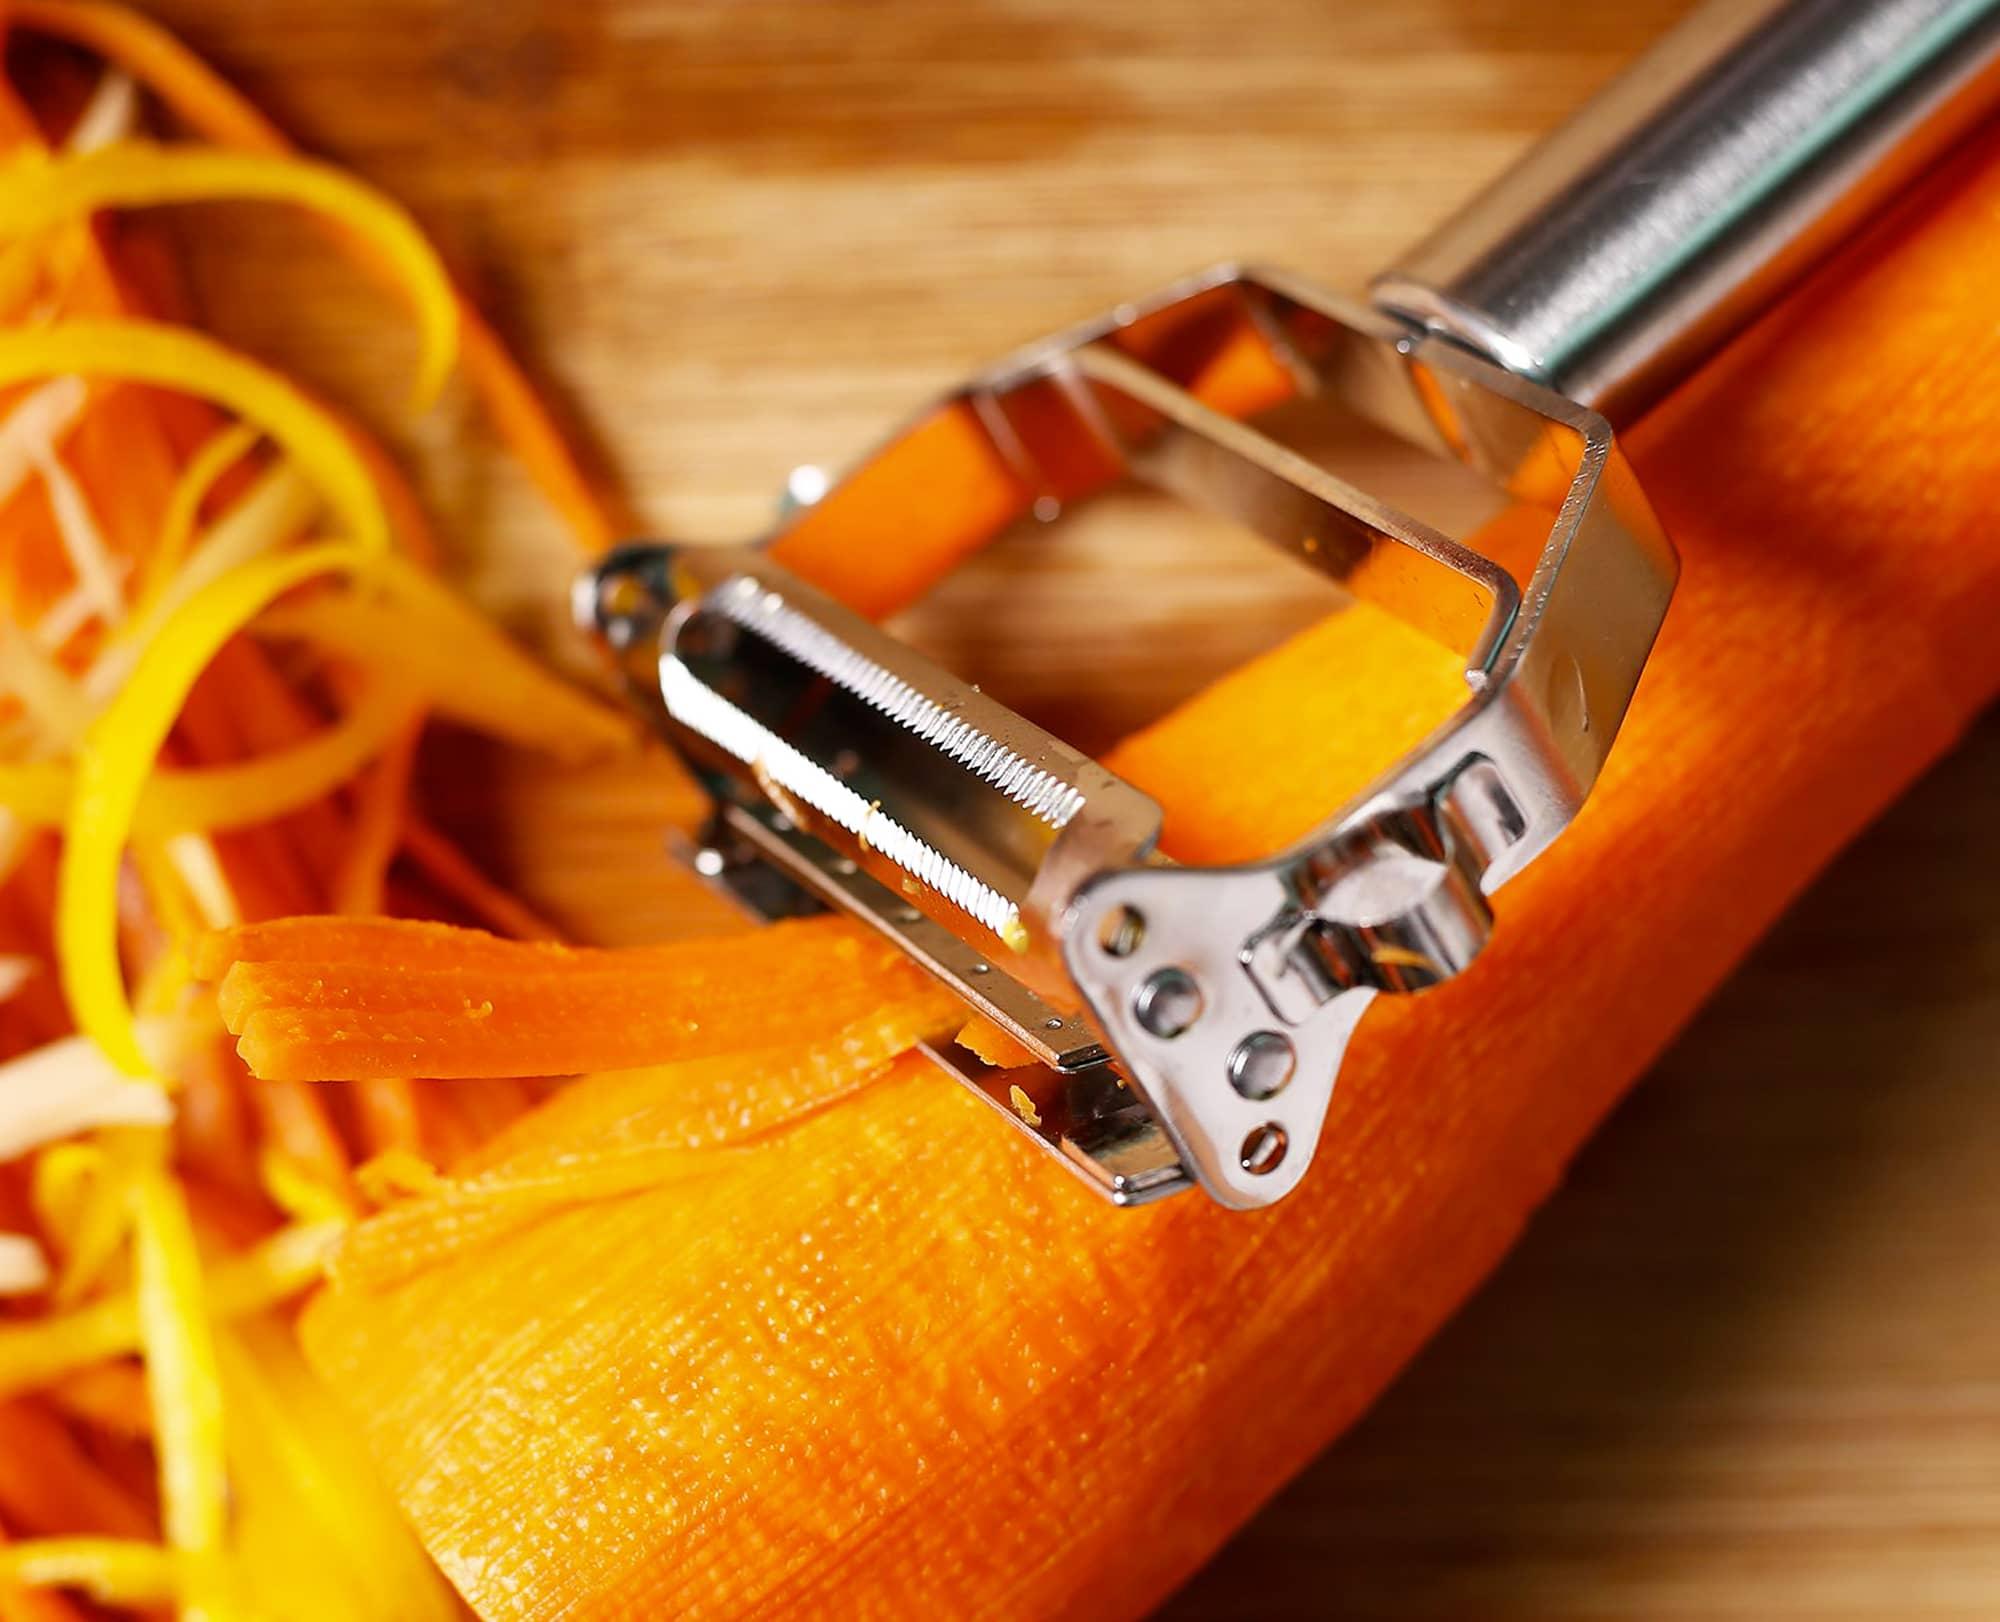 Using Benchusch double blade peeler to julienne carrot